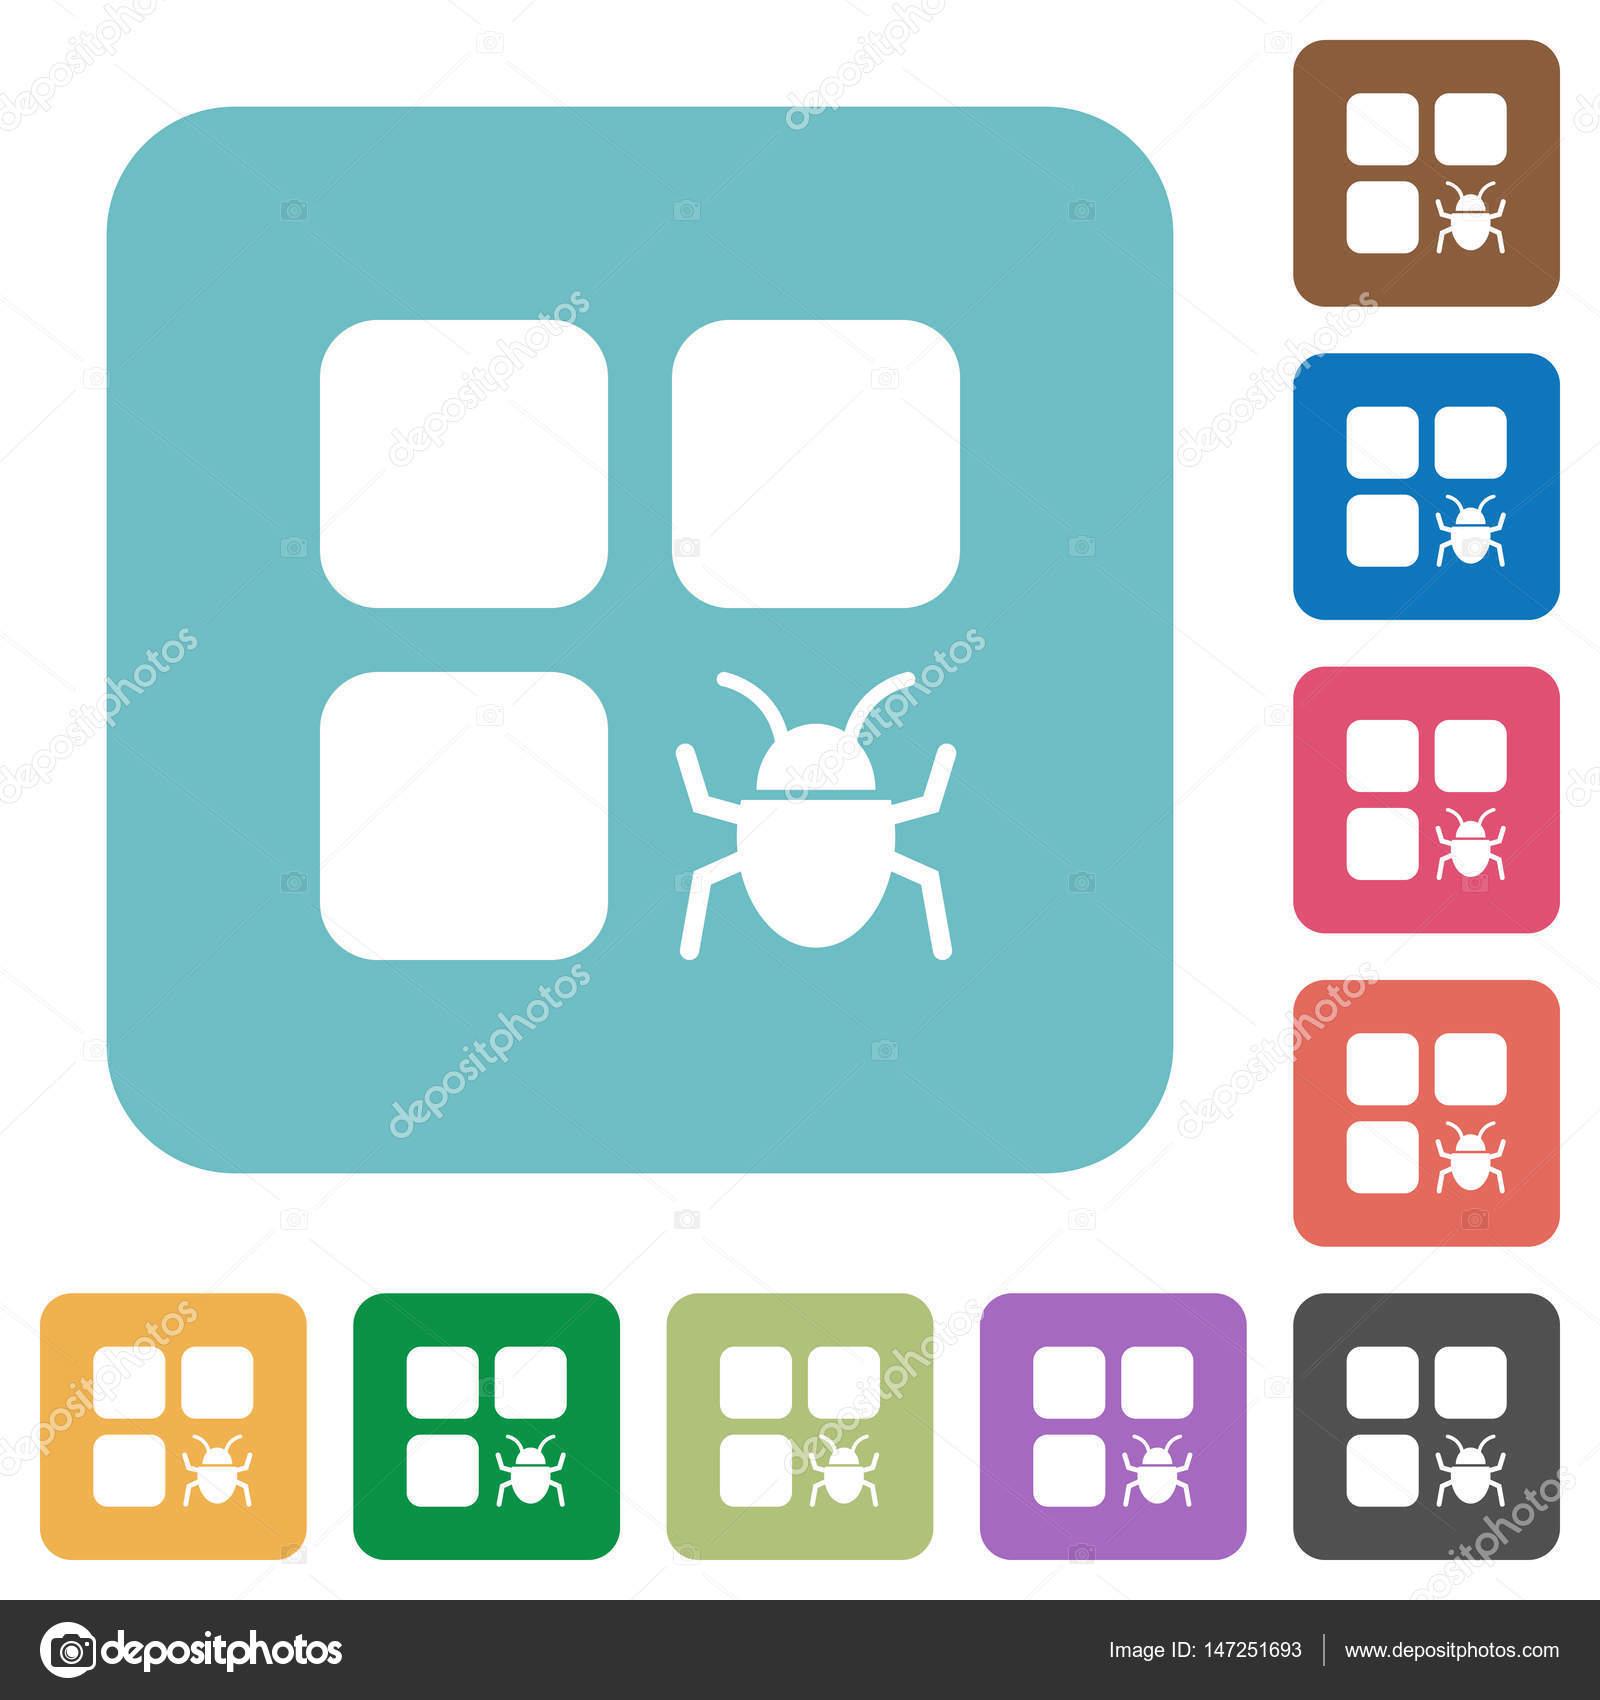 Komponente Bug abgerundet quadratisch flach Symbole — Stockvektor ...